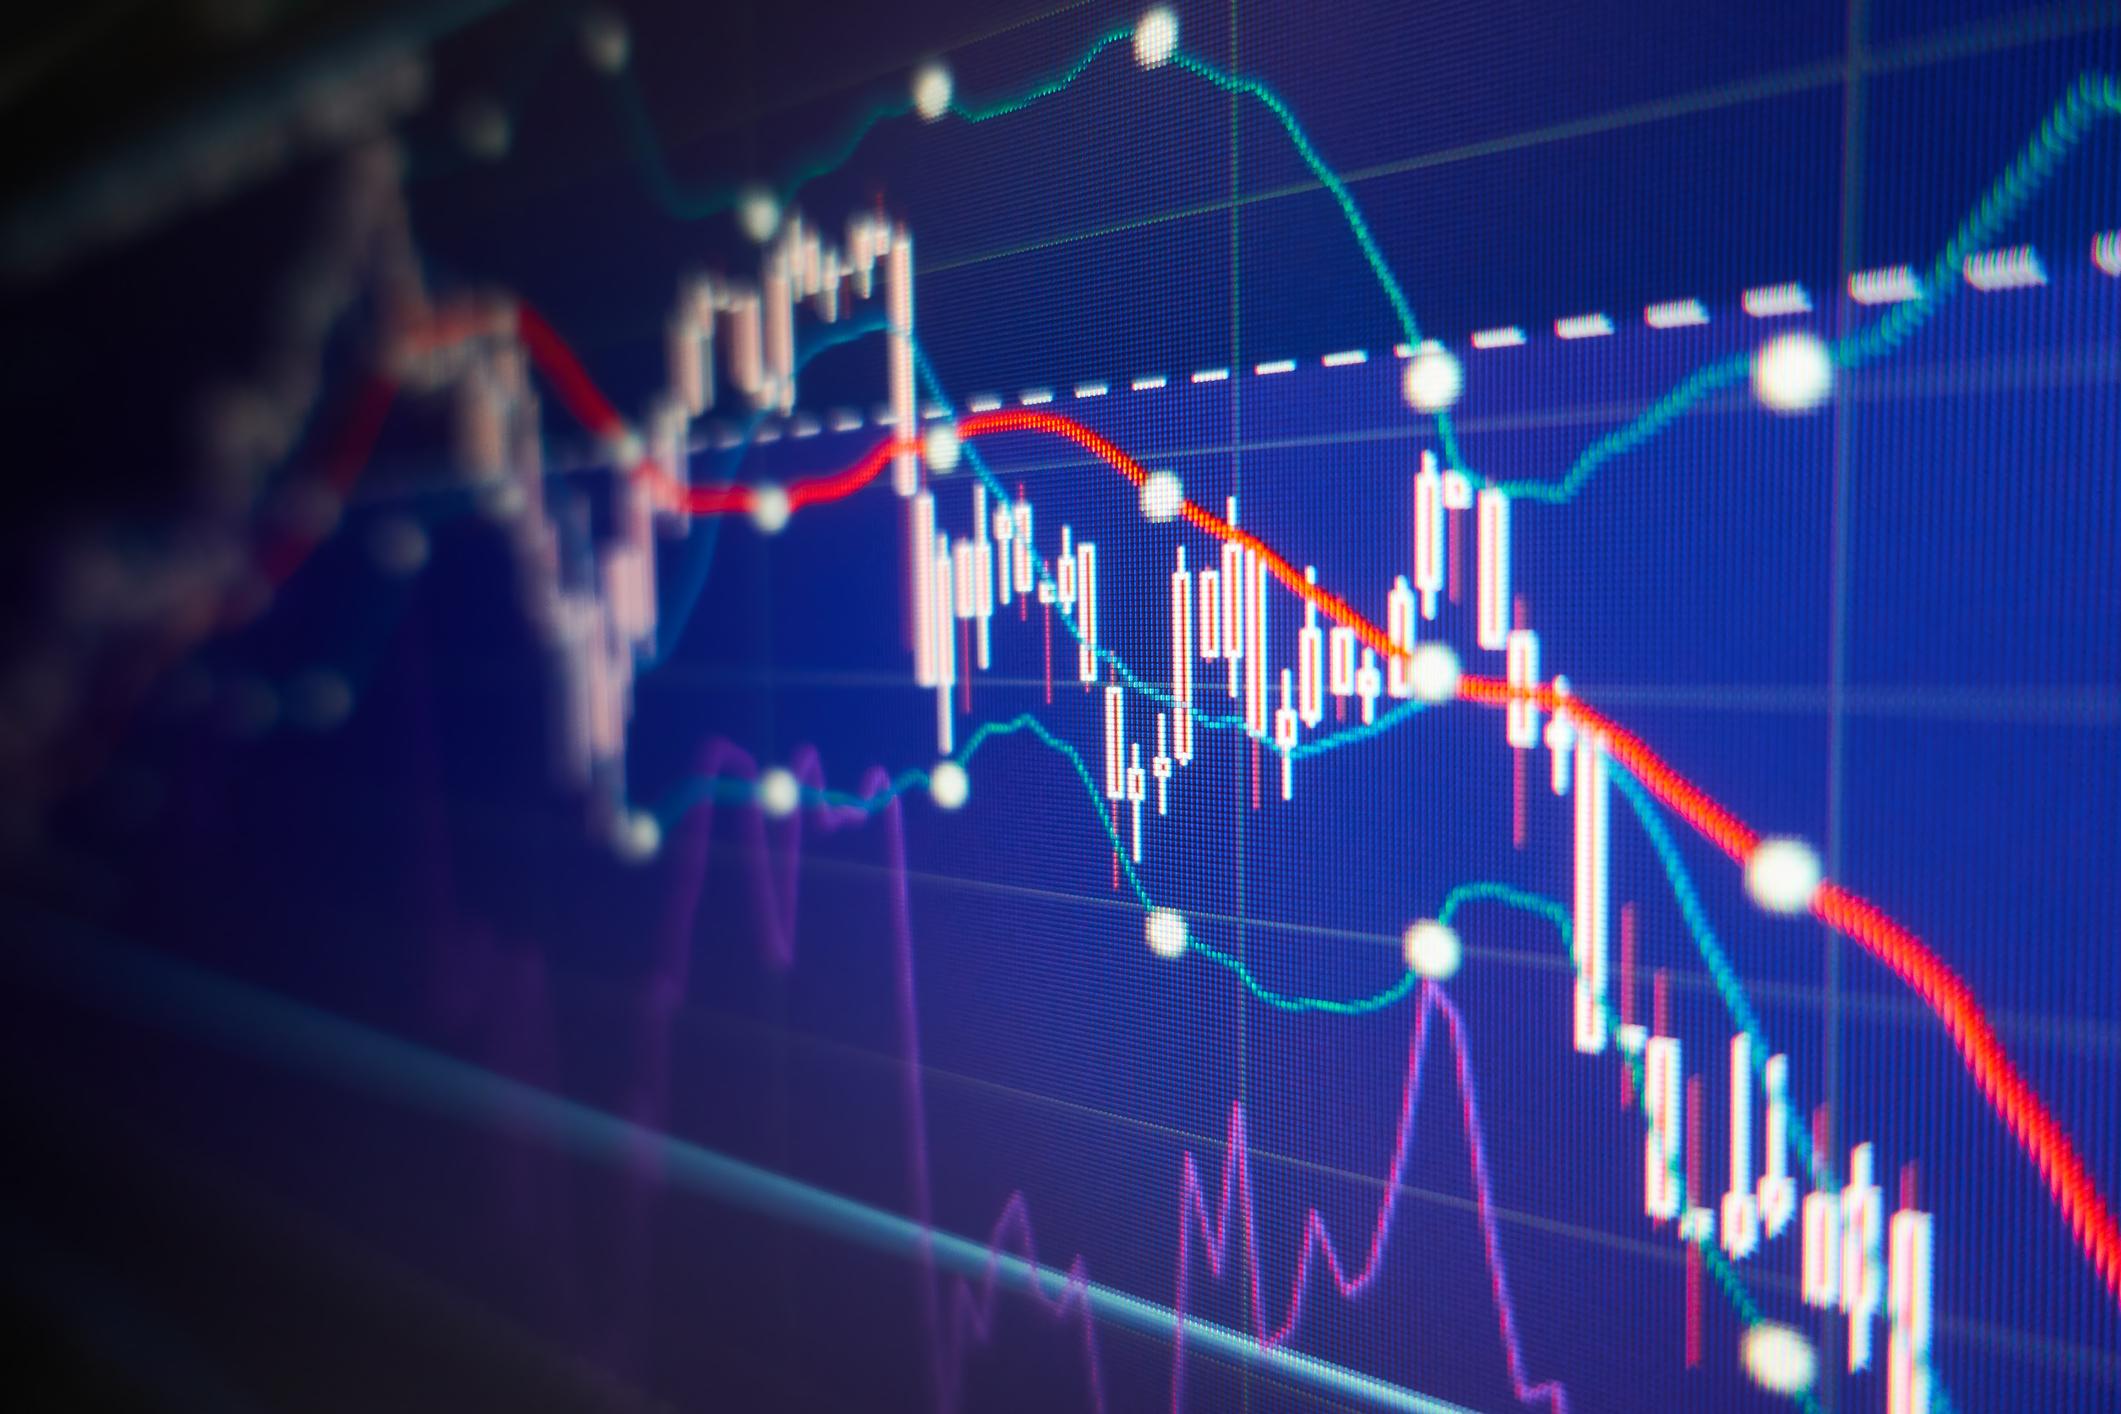 Stock market charts on a colrful display indicating losses